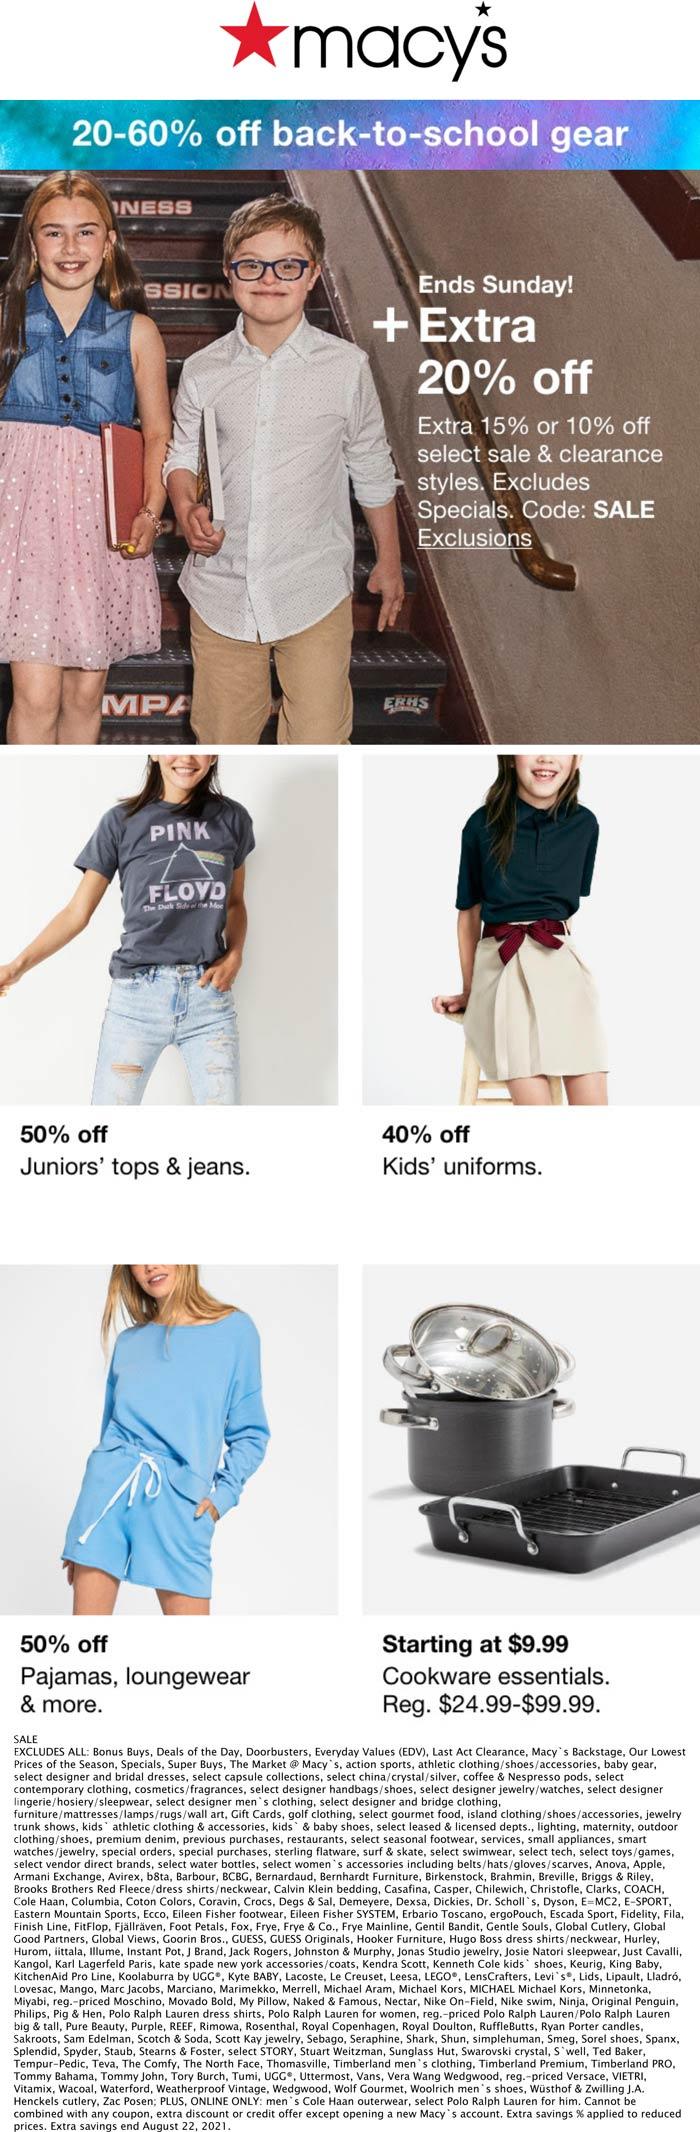 Macys stores Coupon  Extra 10-20% off at Macys, or online via promo code SALE #macys